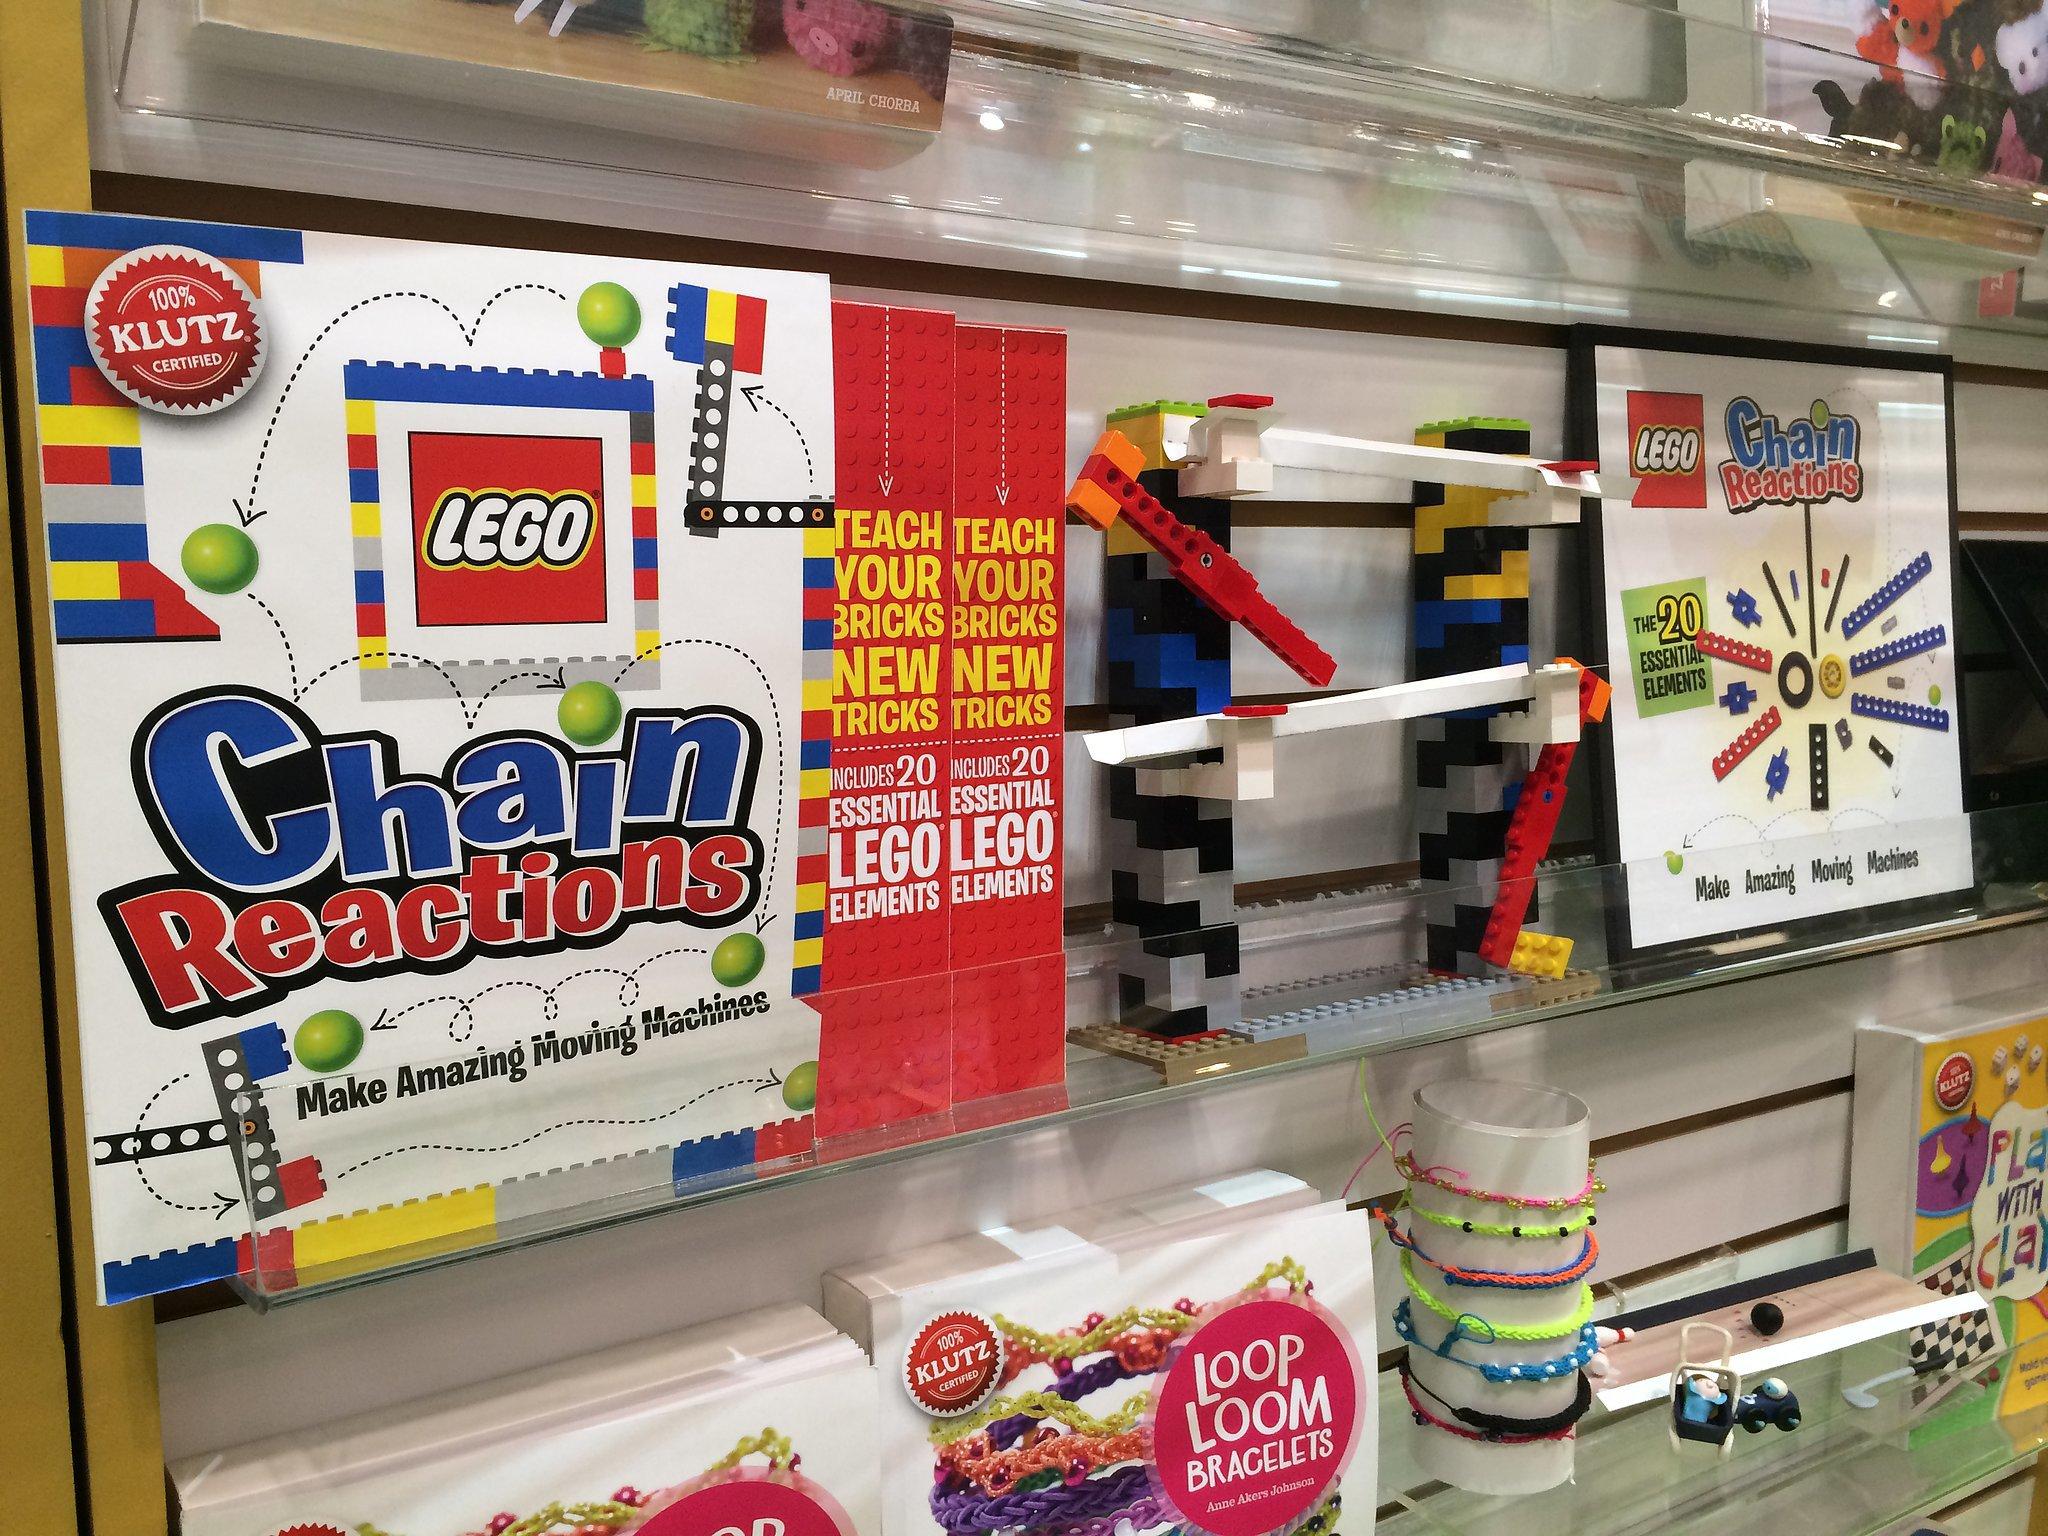 Klutz Lego Chain Reaction